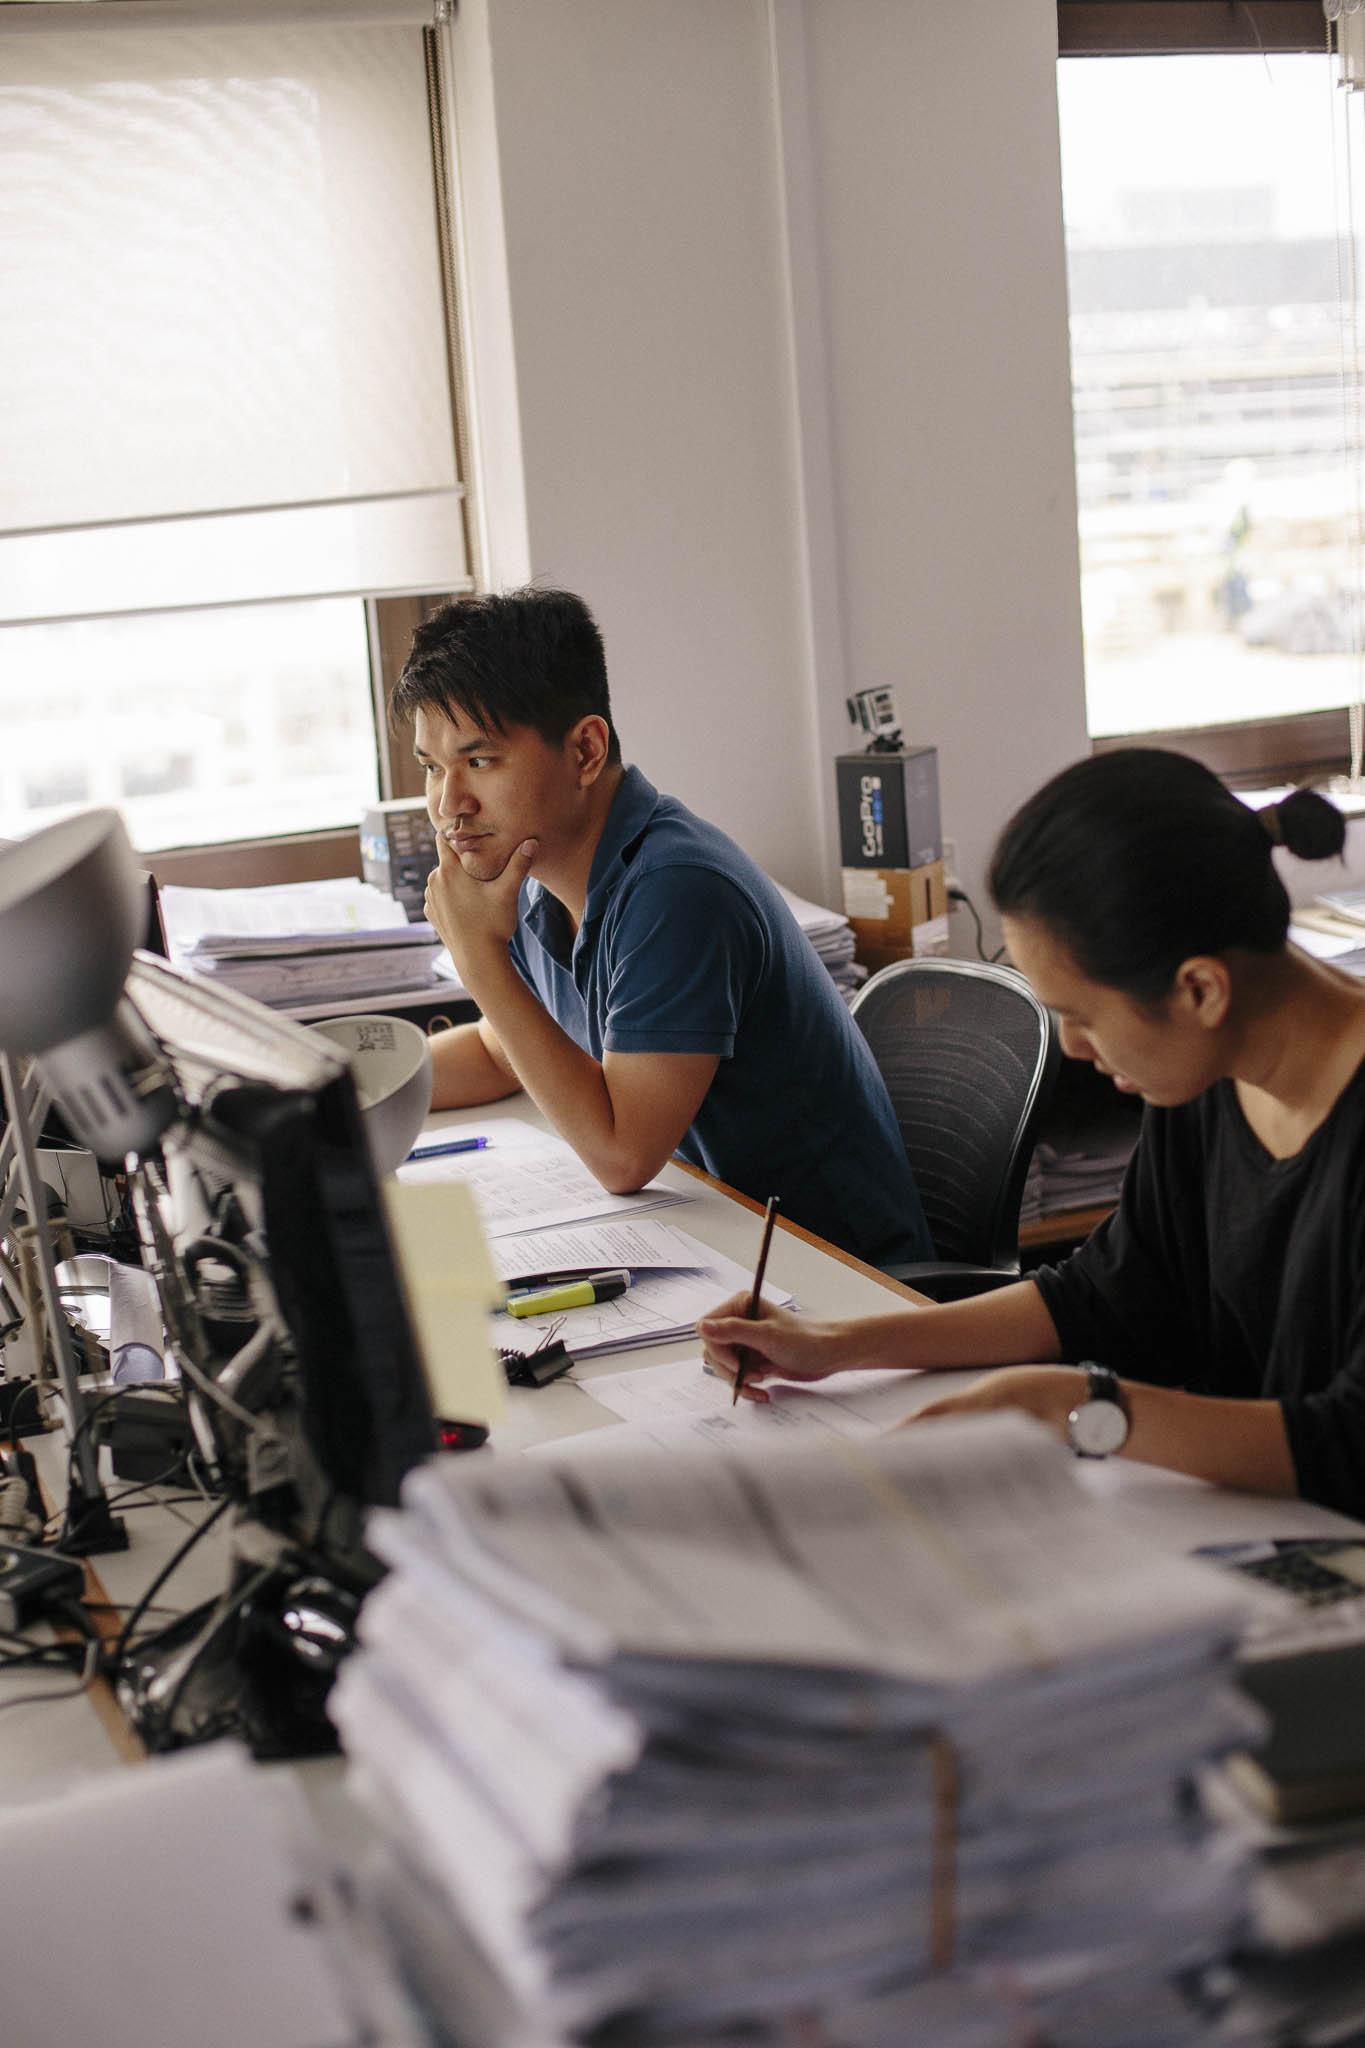 singapore-photographer-editorial-commercial-zakariazainal-studio-milou-ngs--4.jpg